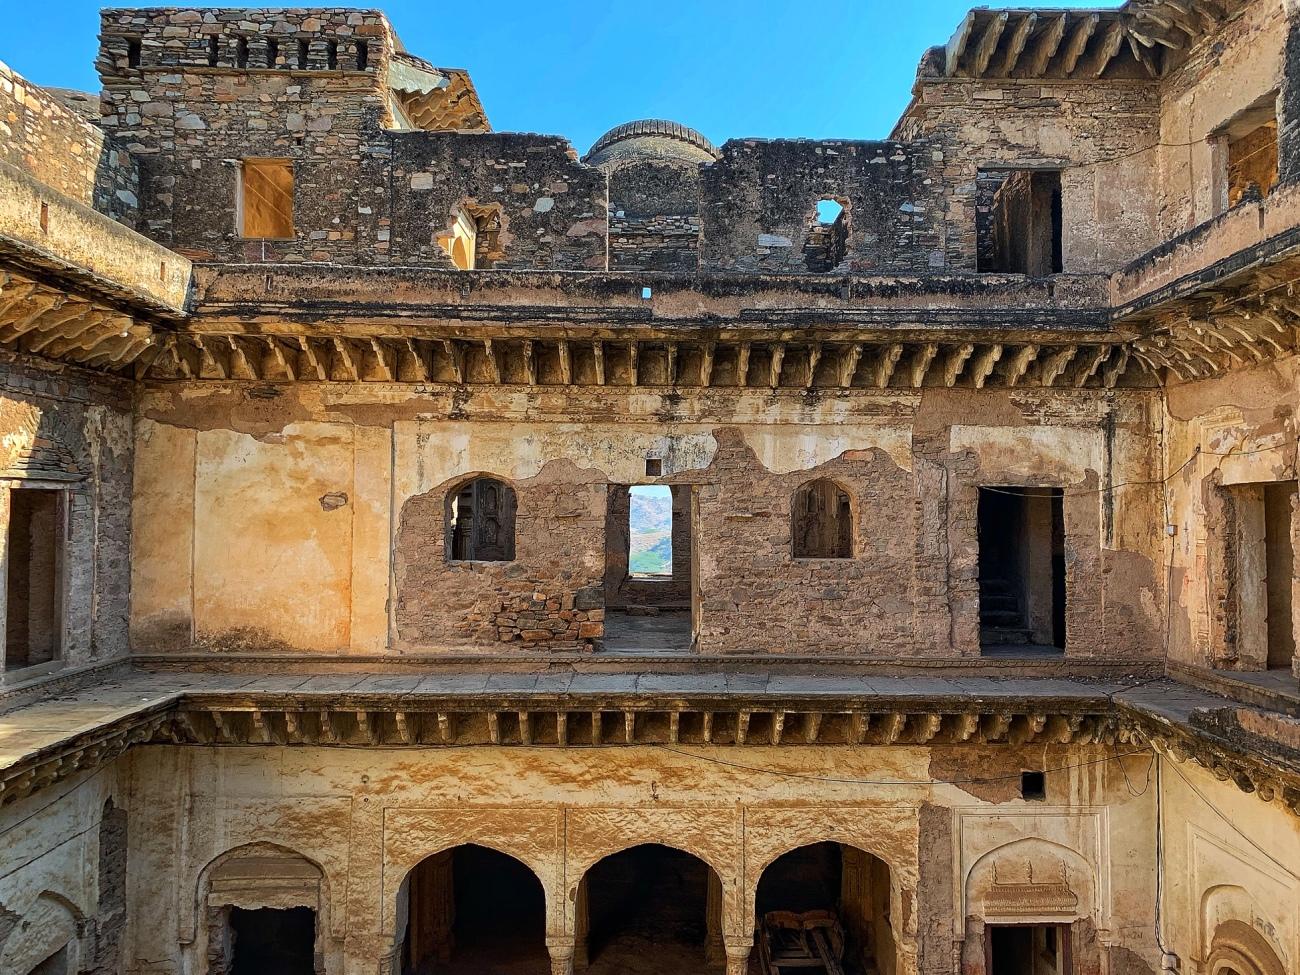 A Magnificant Maze of Discoveries - Qila Tatarpur